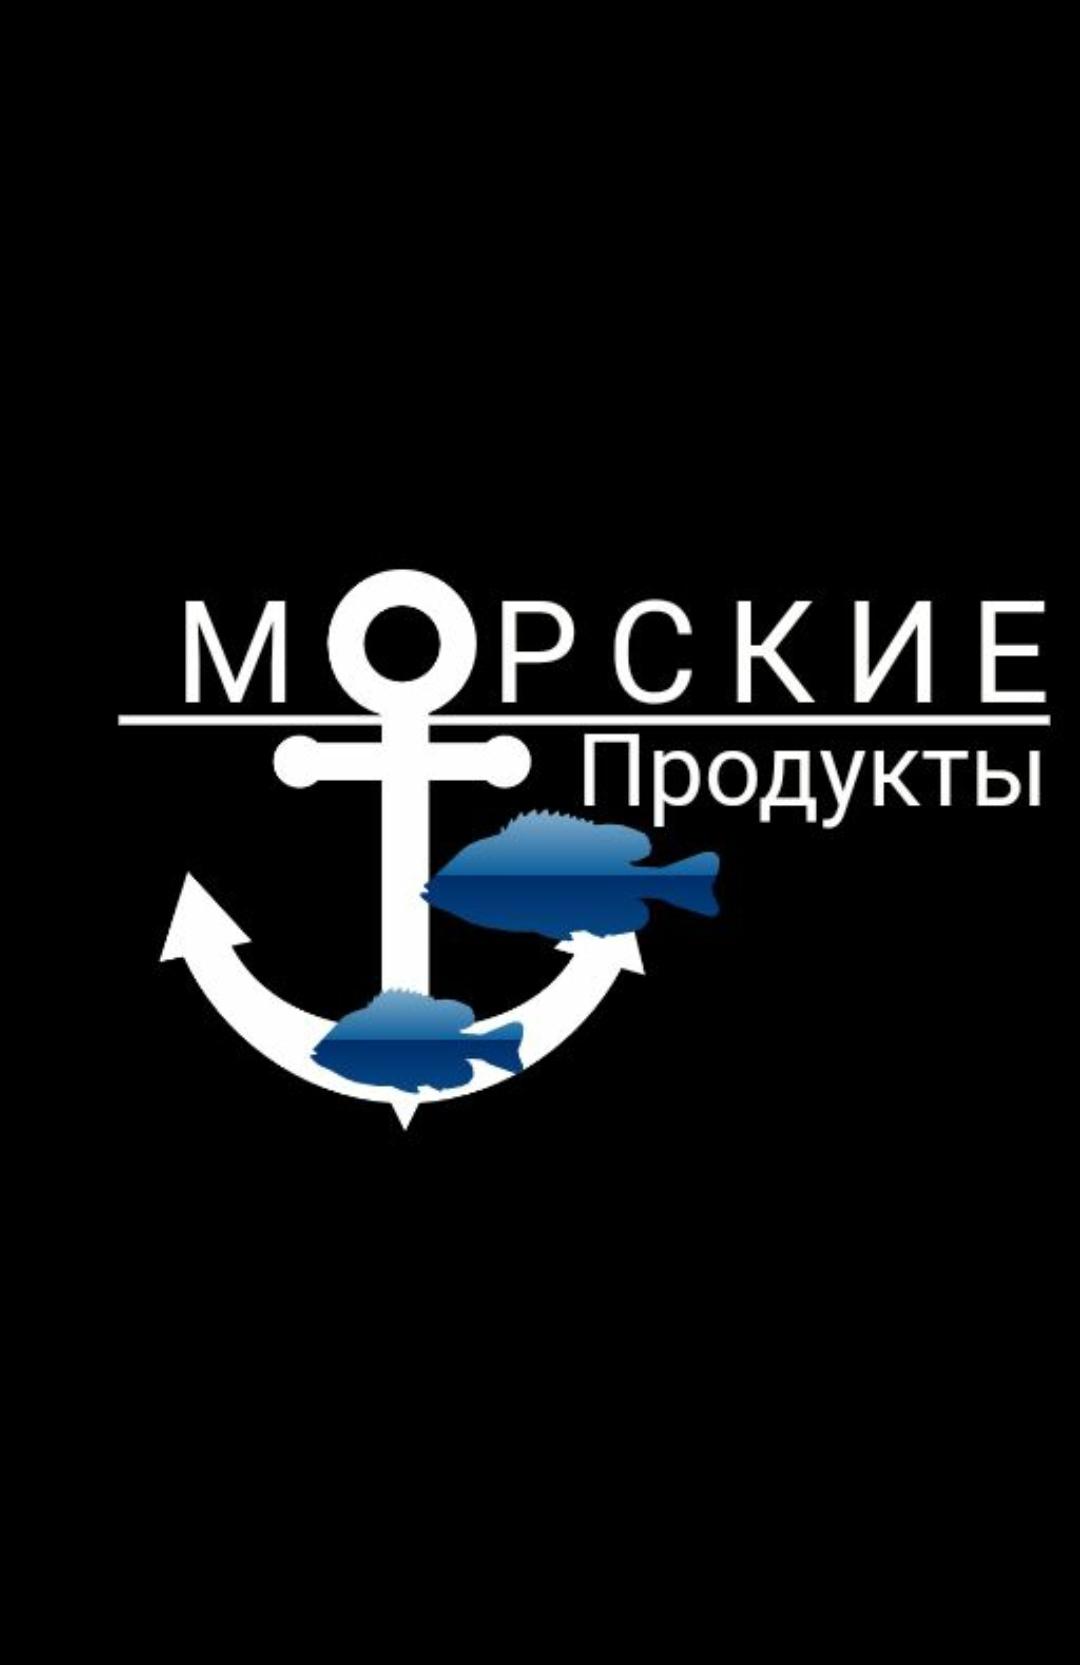 Разработать логотип.  фото f_0495ec677b124086.jpg